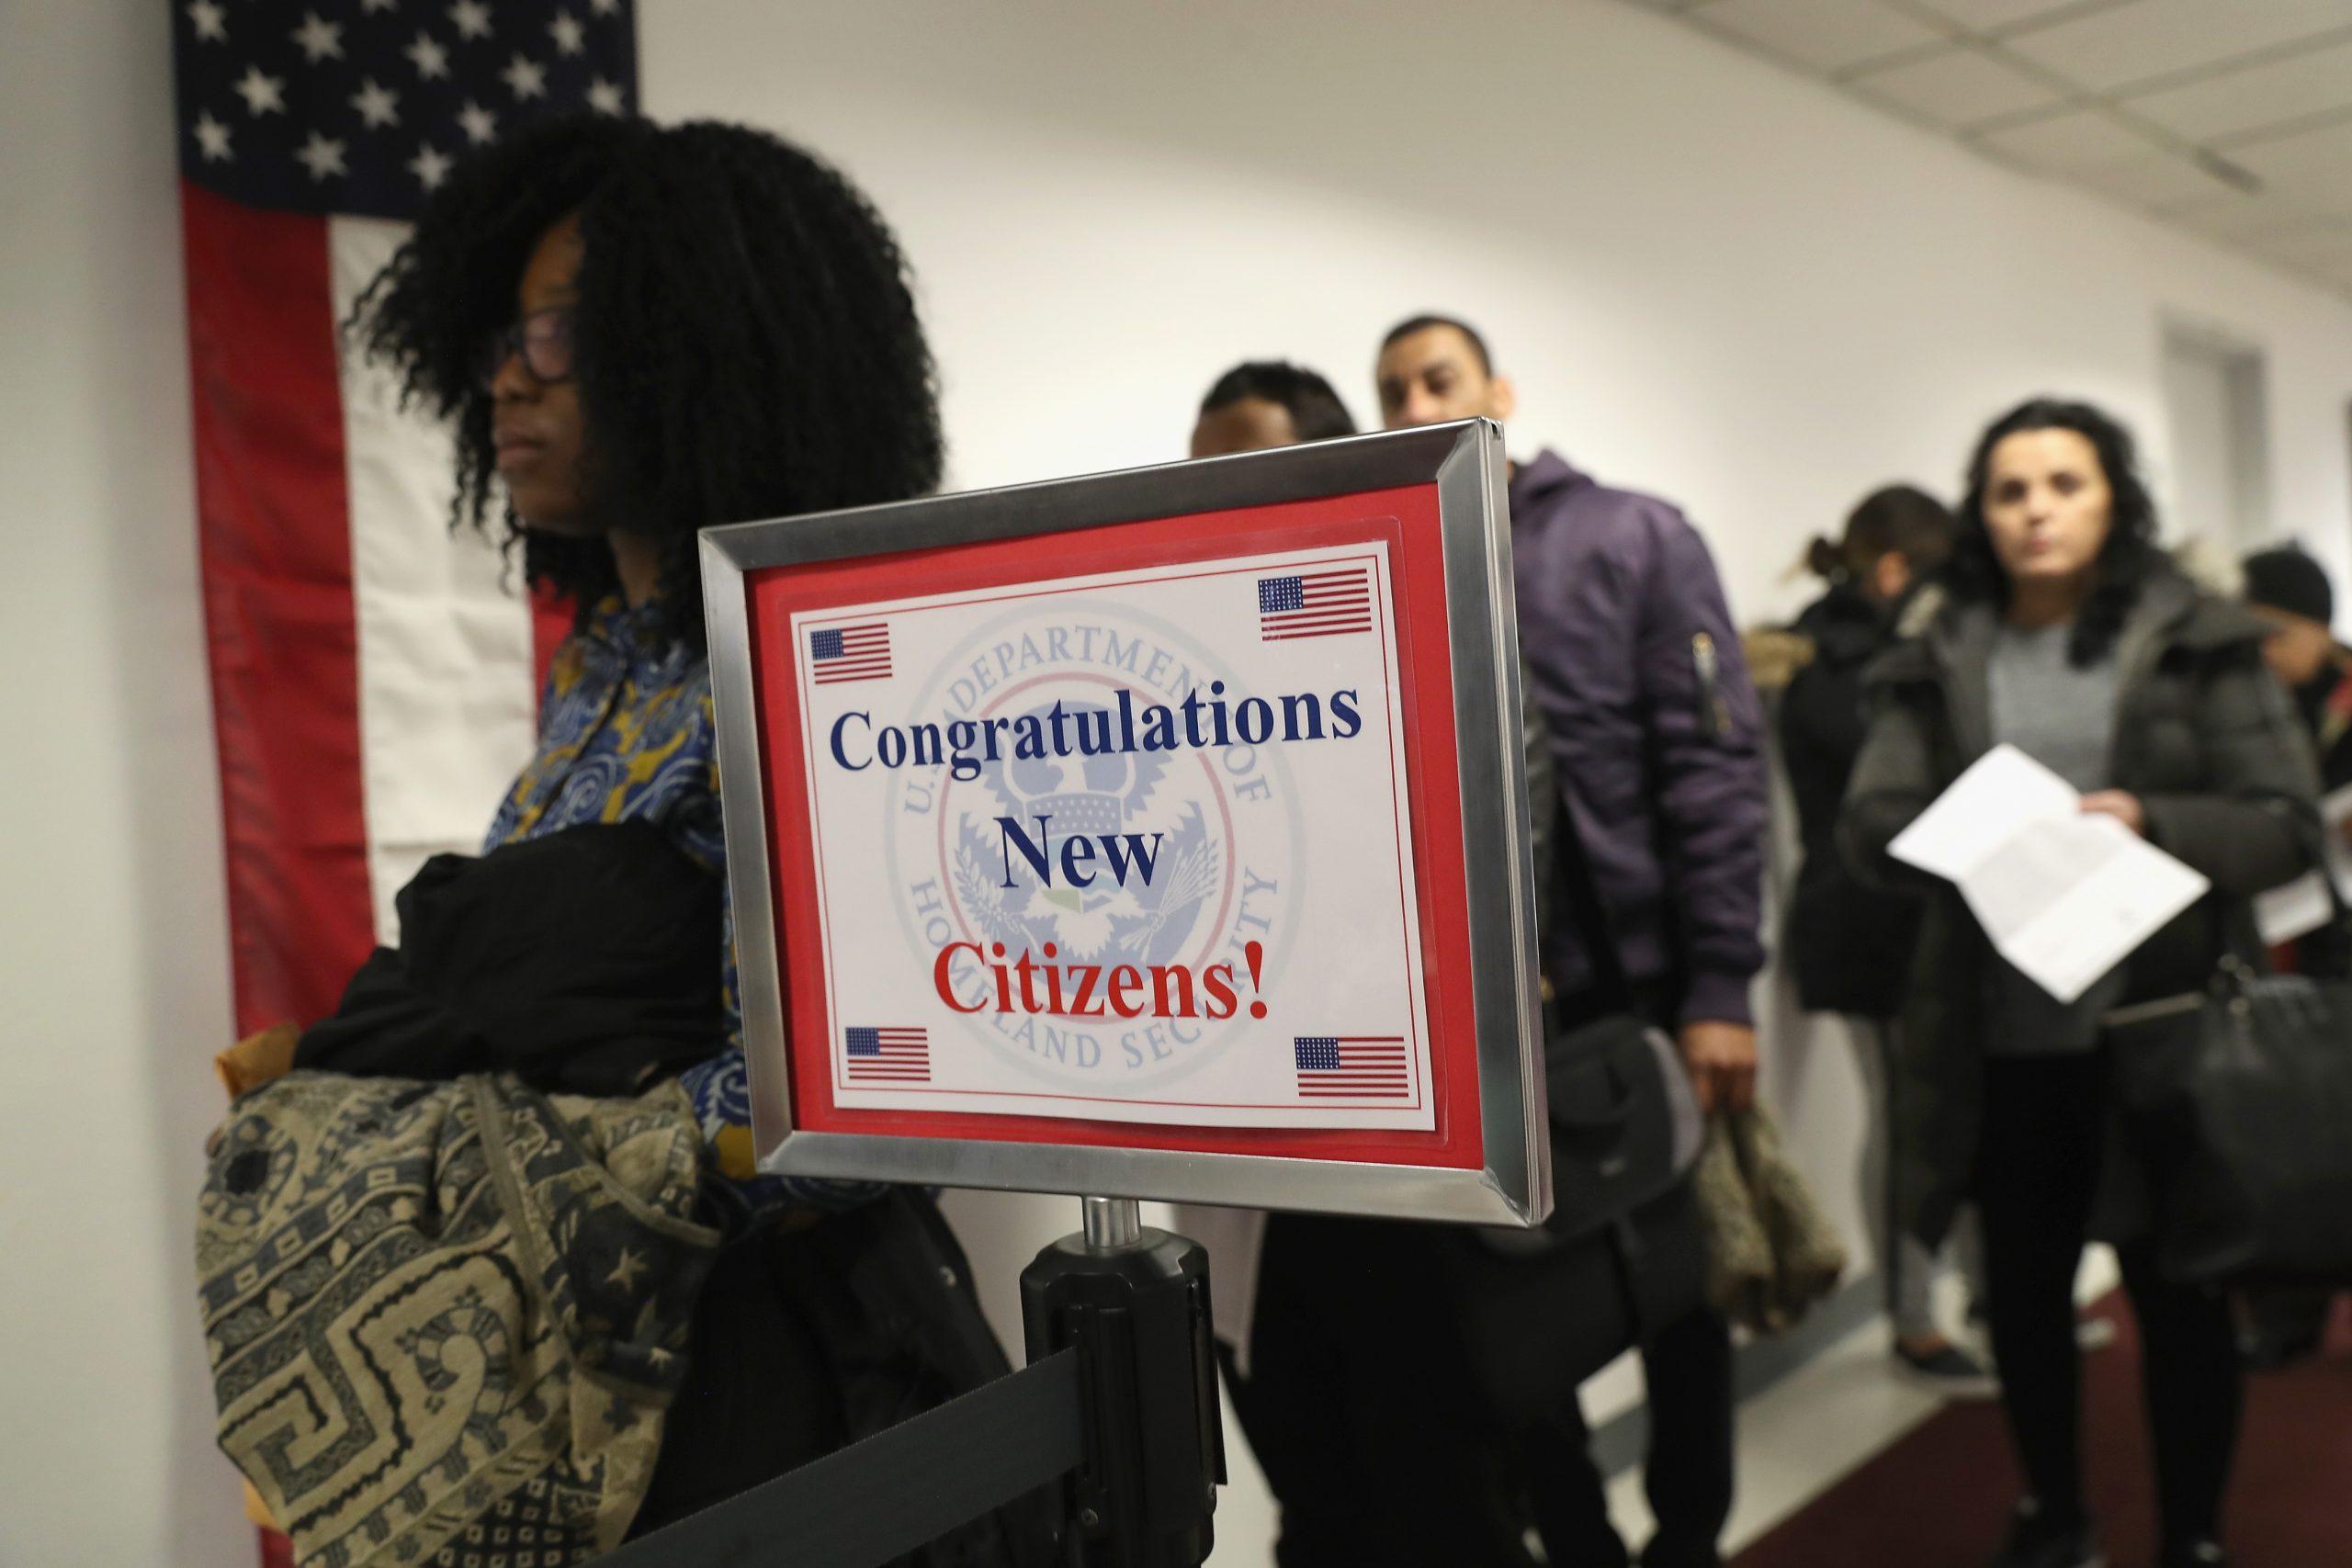 Congratulations New Citizens